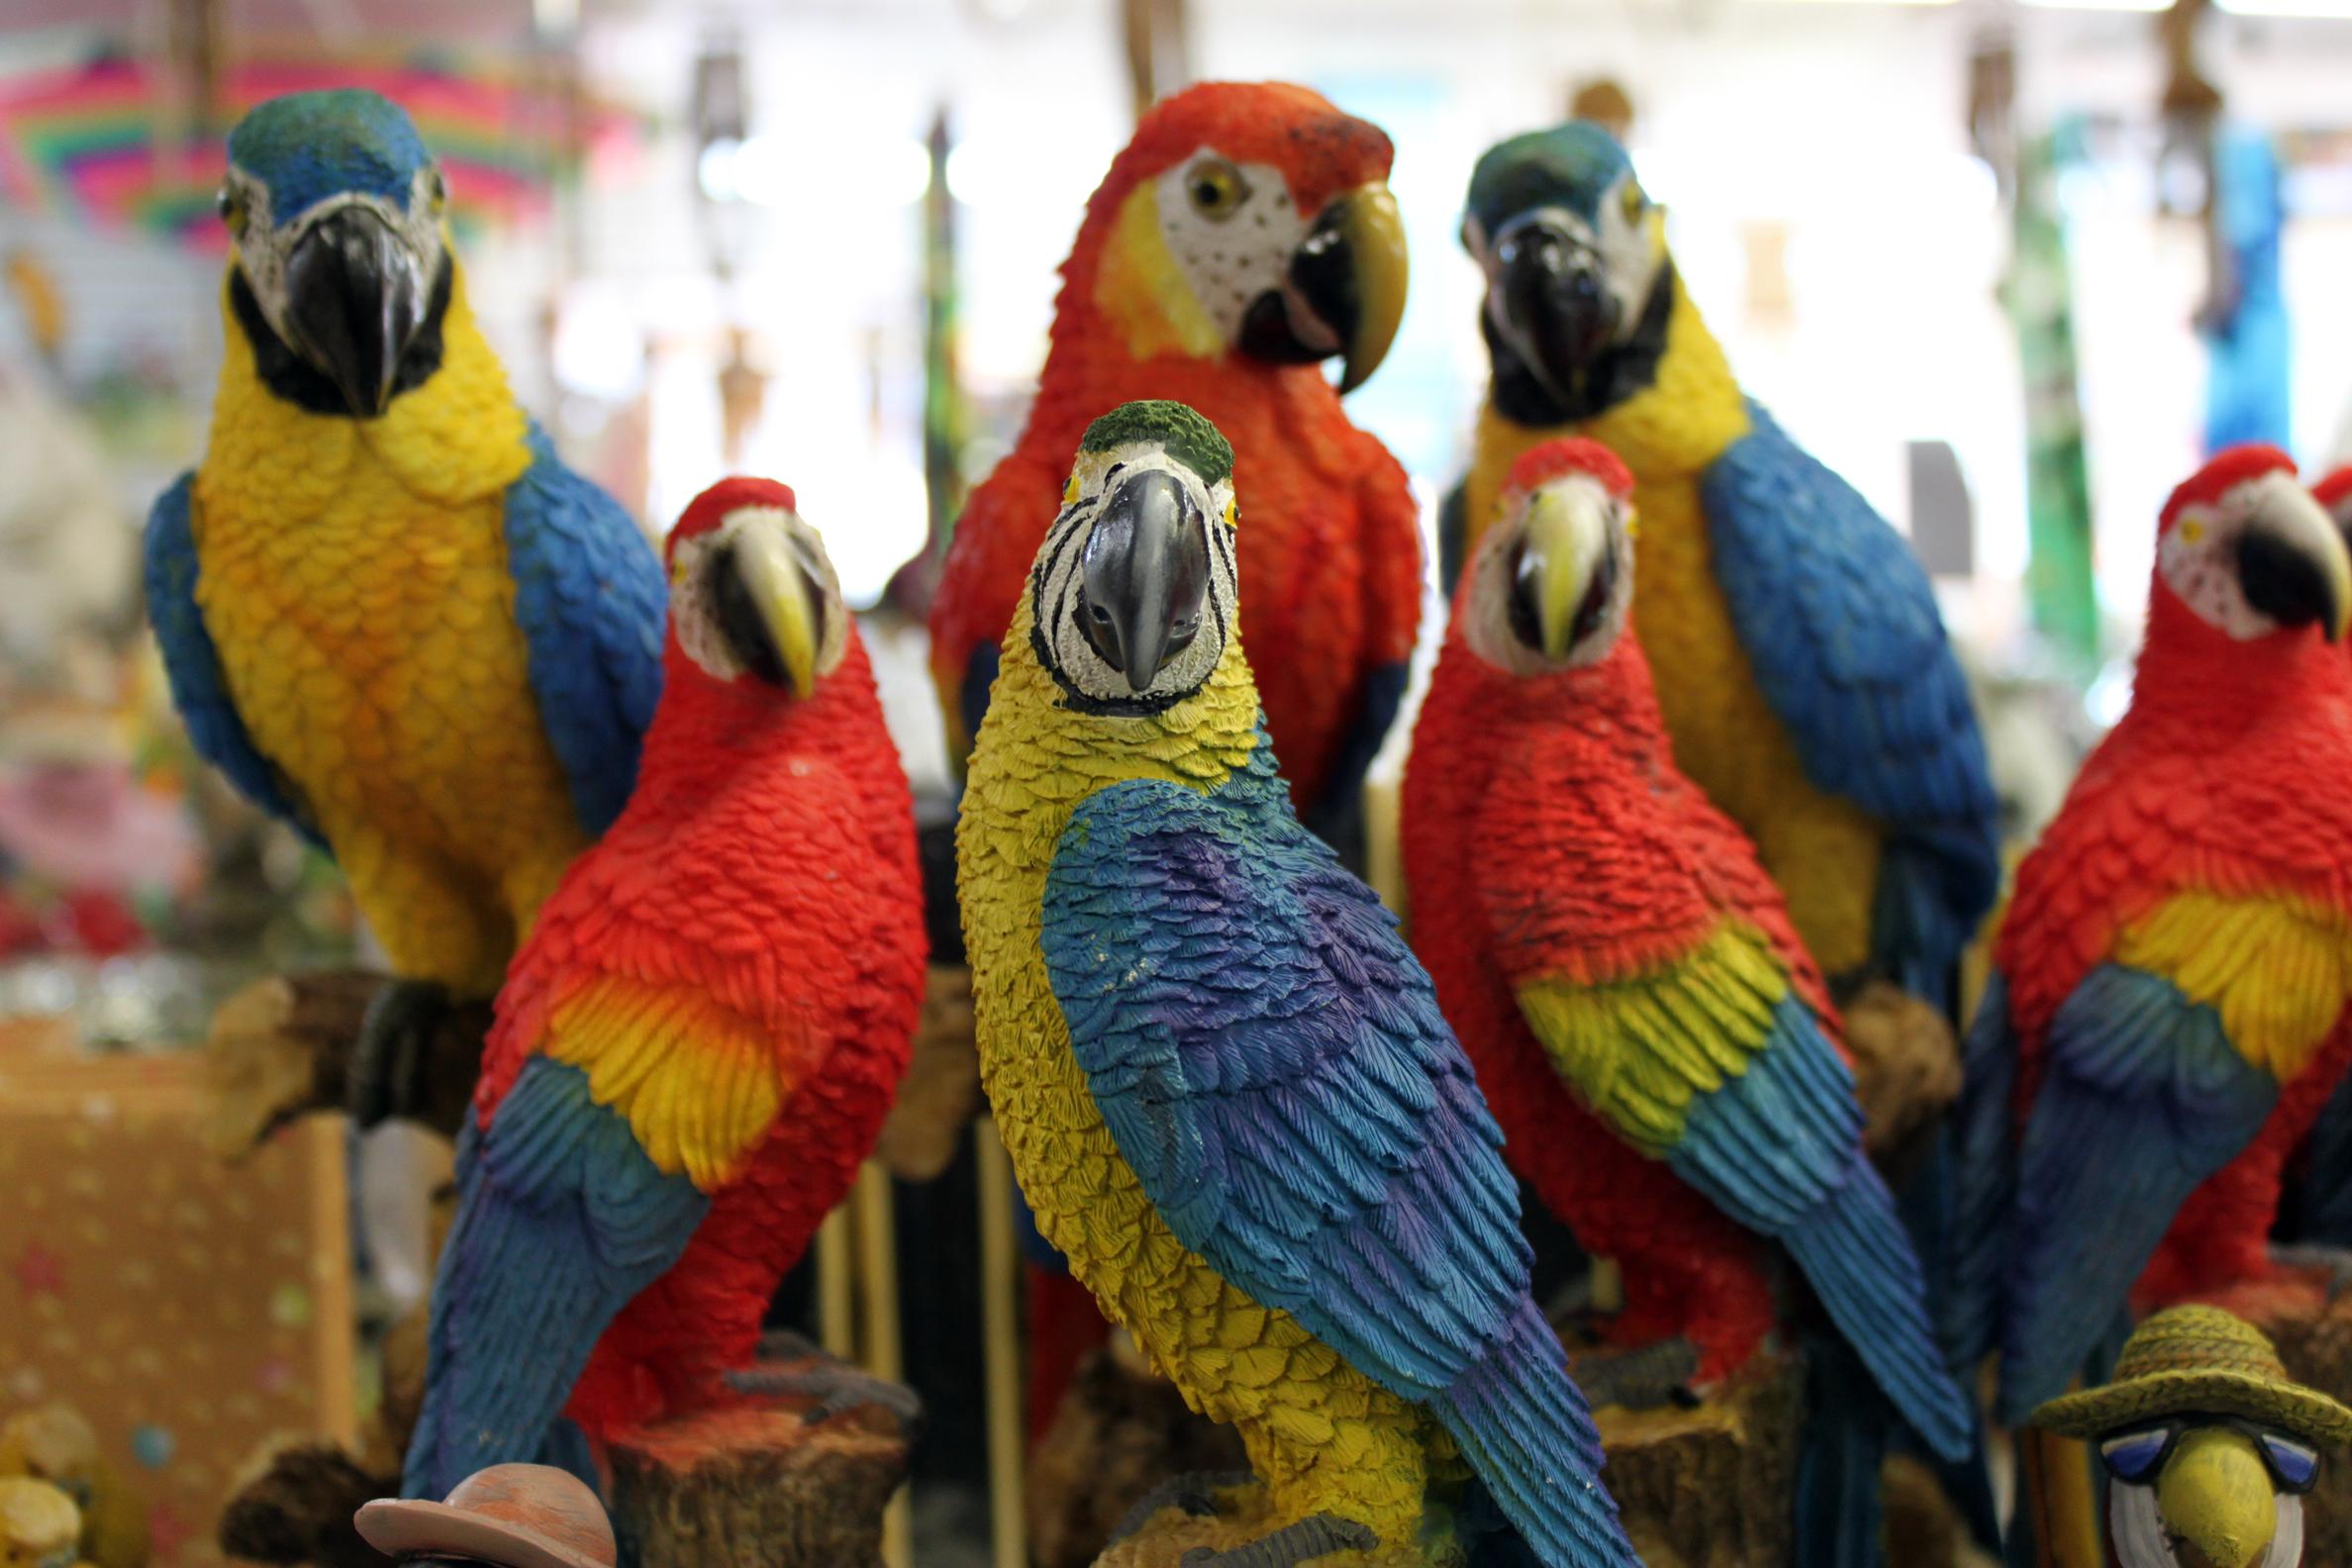 Sentinel_parrots.jpg